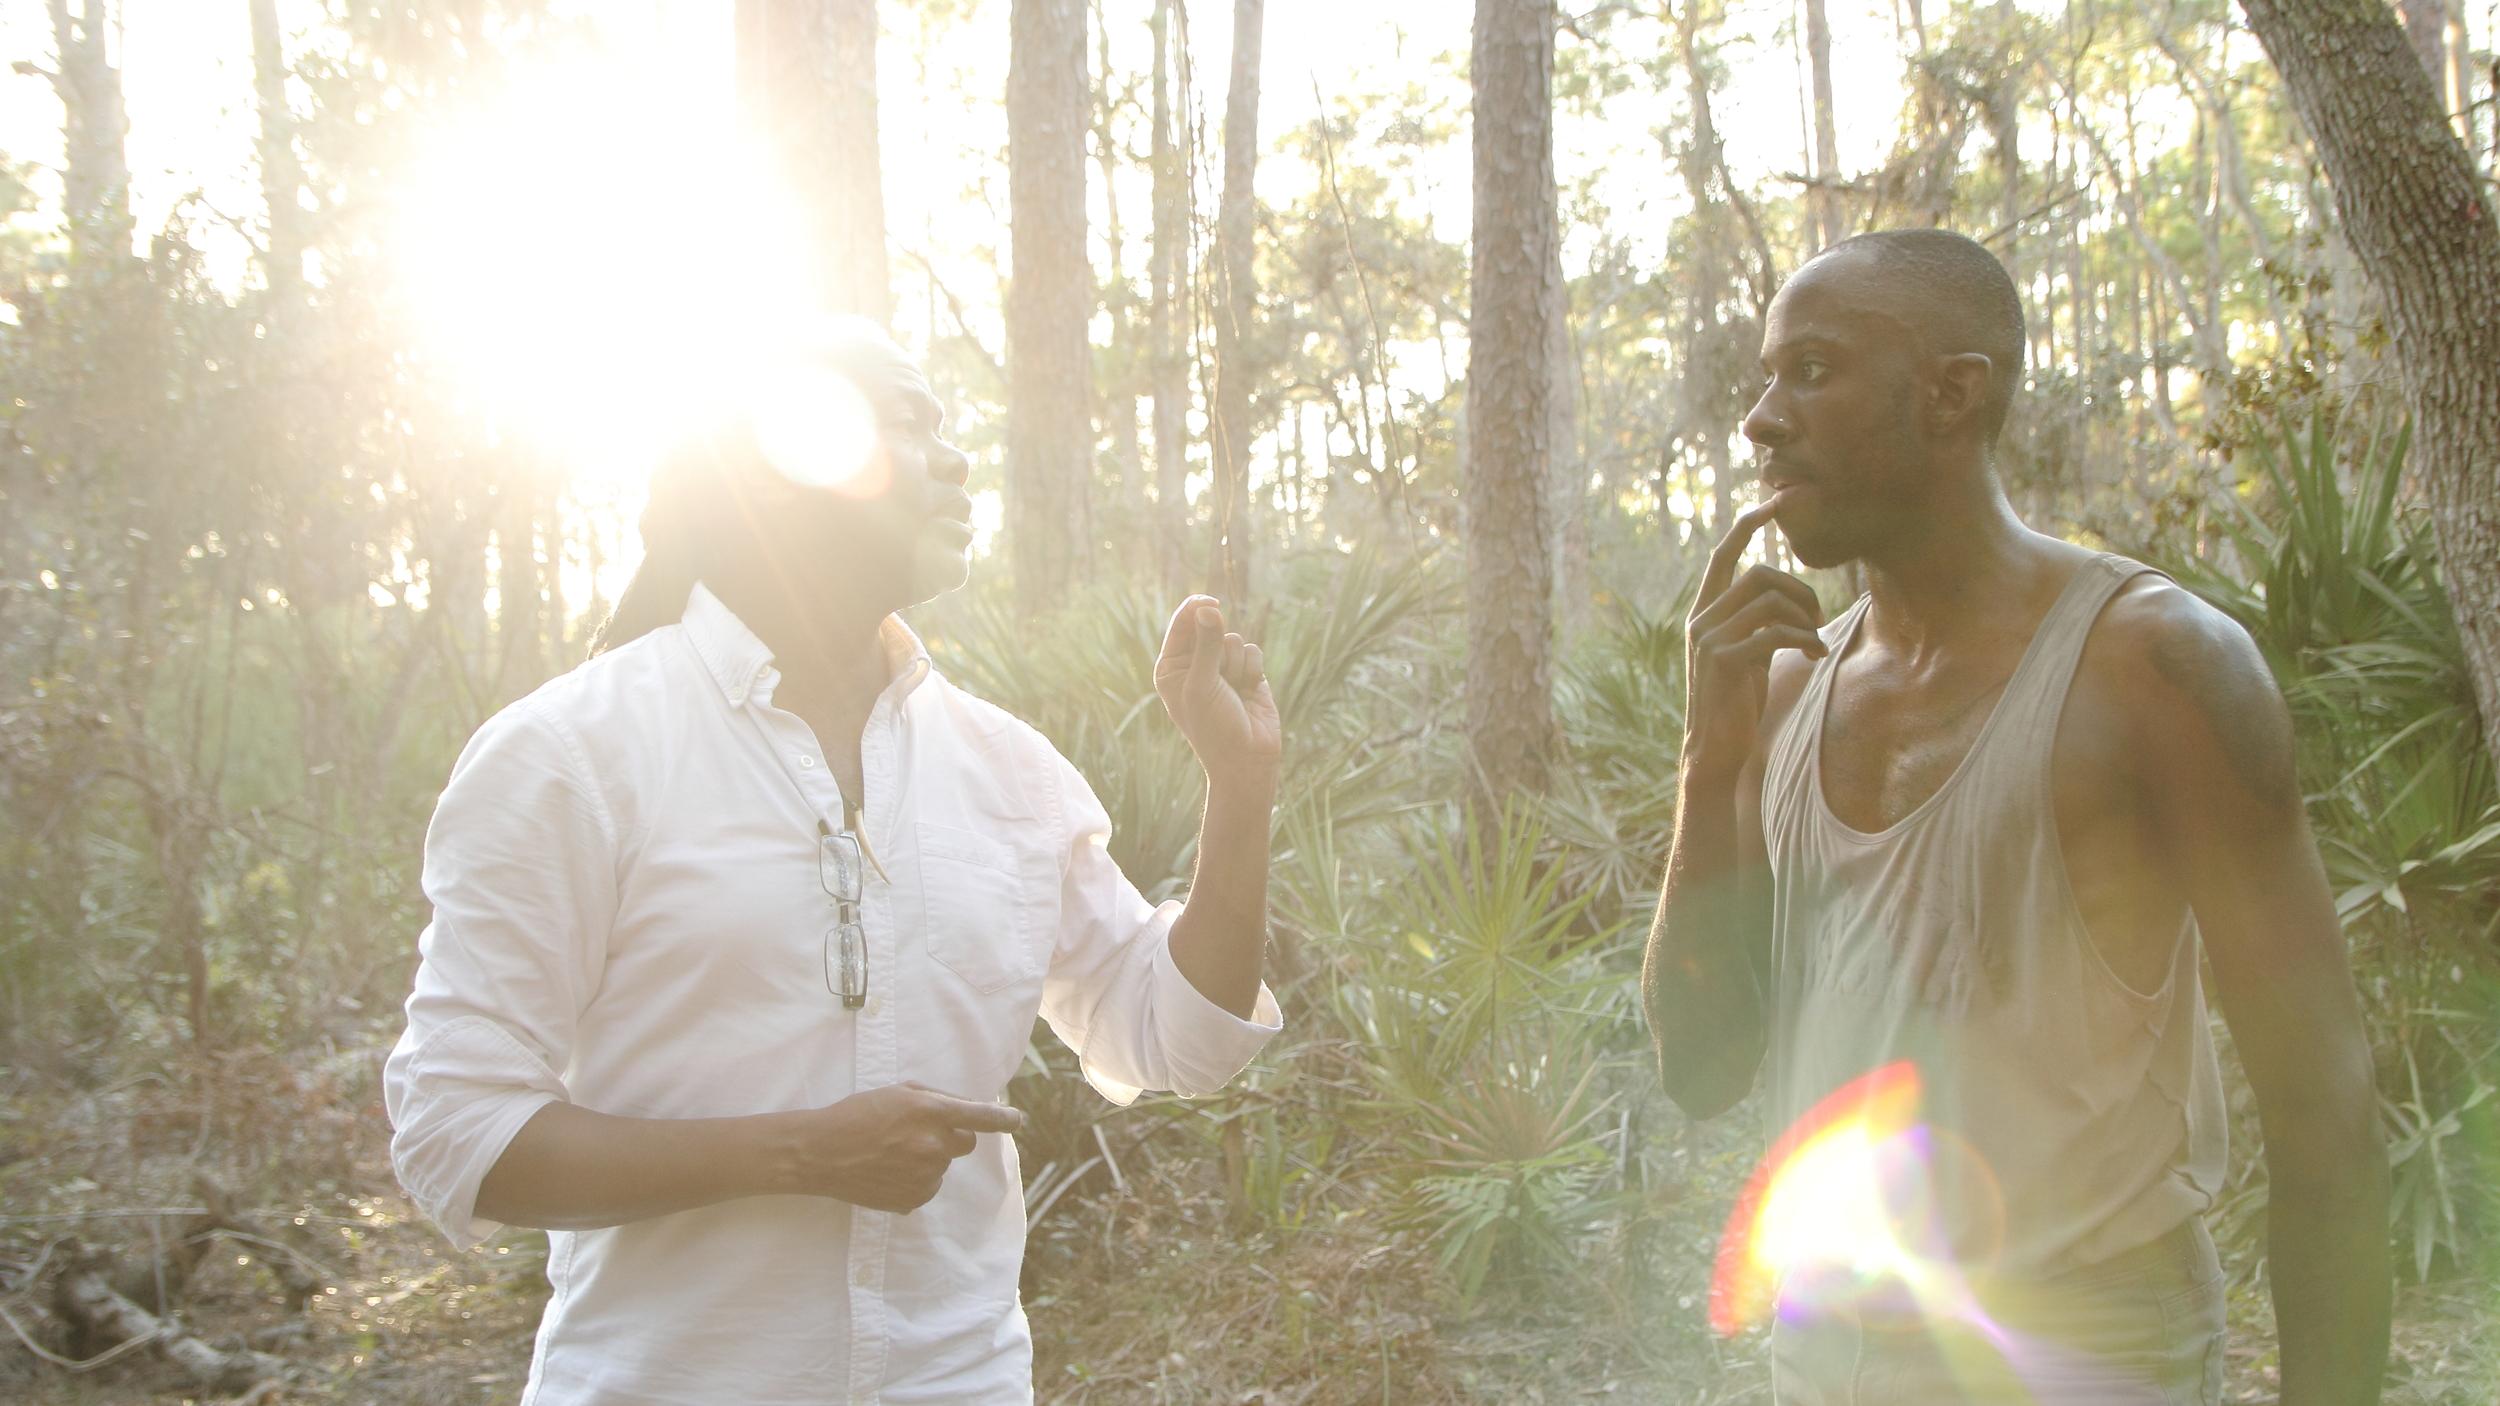 F&H_ReggieWilson & RajaFKelly_Photo © Aitor Mendilibar.JPG